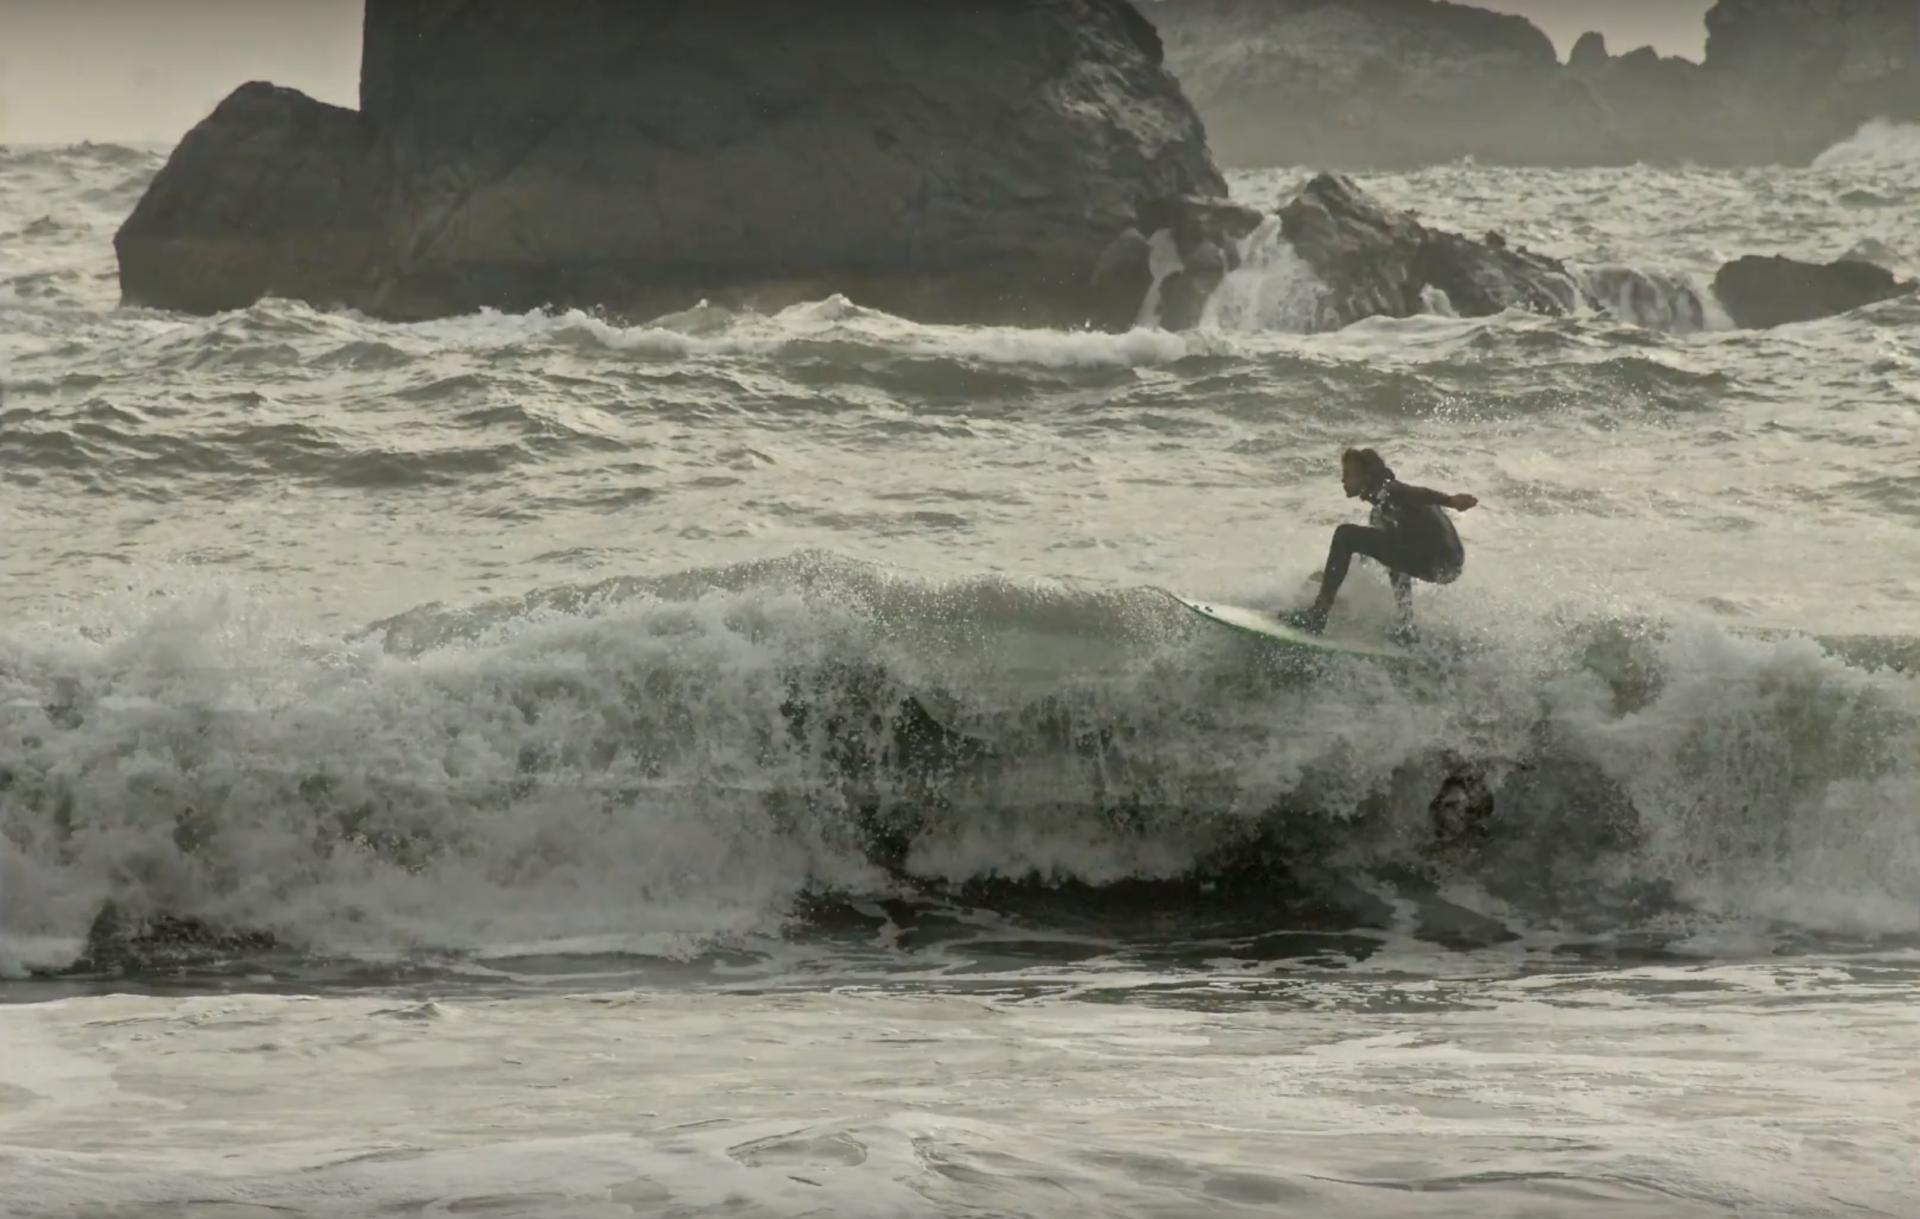 HSU psychology student William Doudna surfing in Humboldt. Photo by Michelle Meyers.